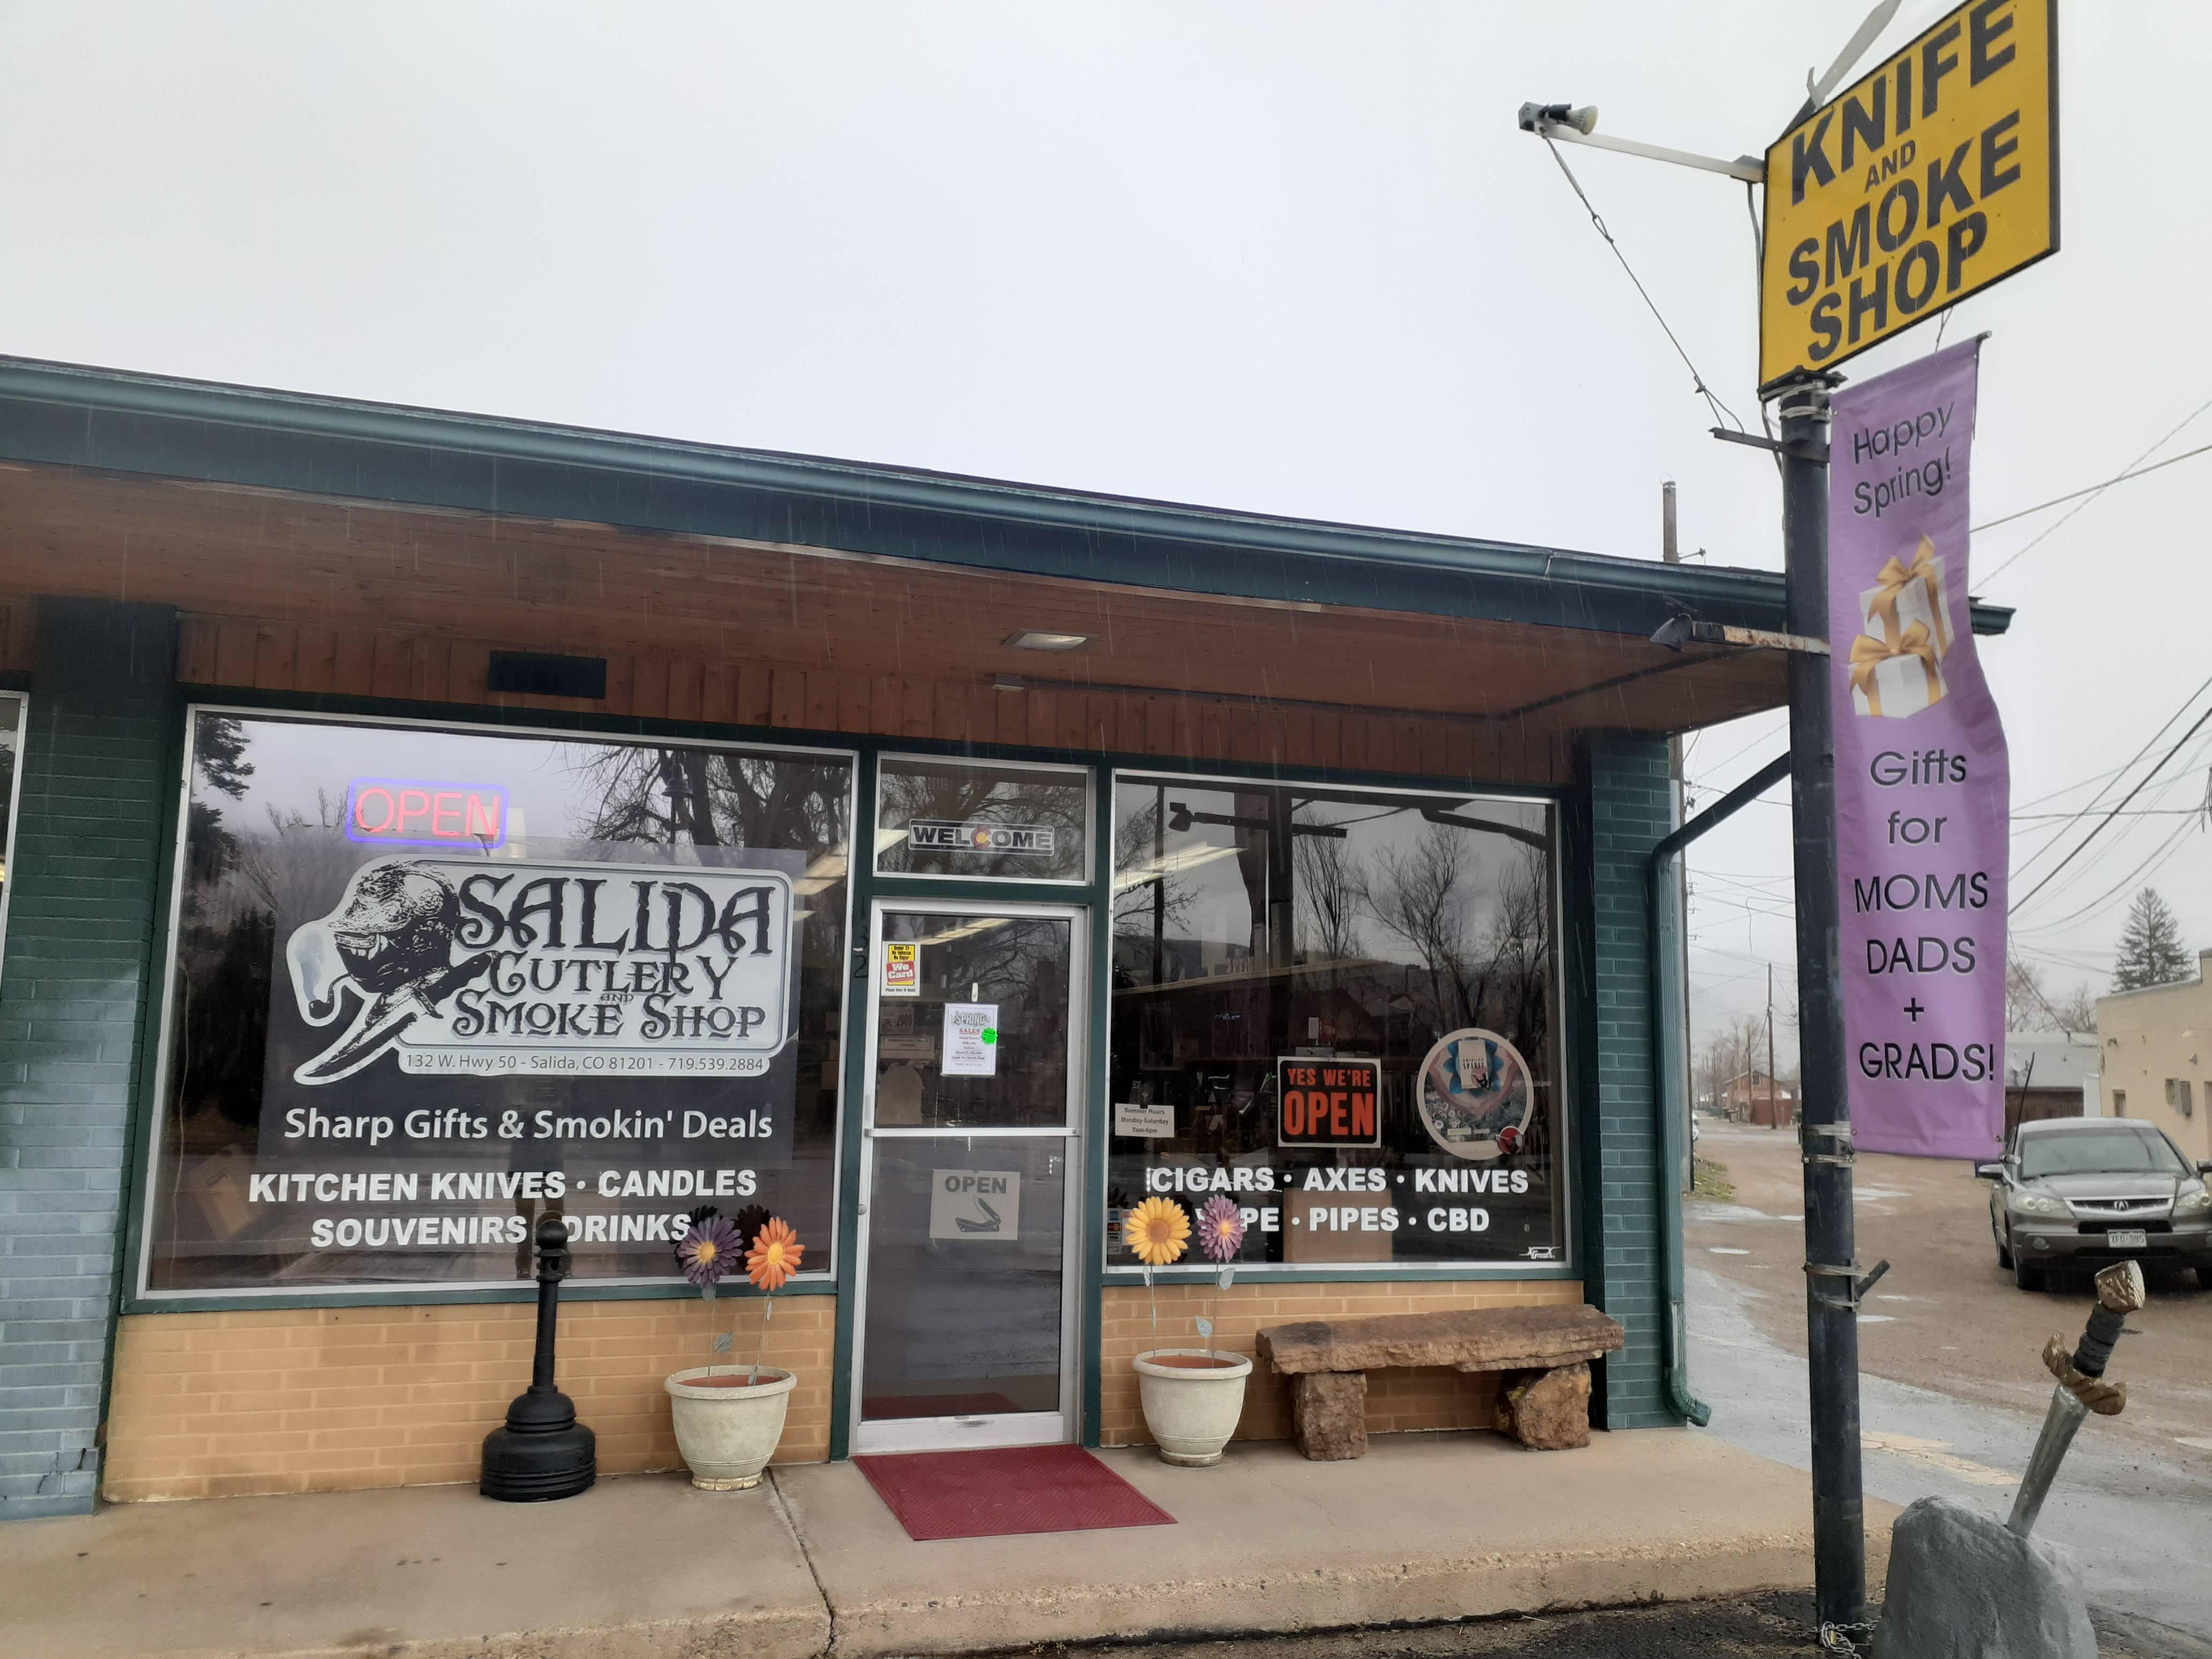 Salida Cutlery and Smoke Shop April 2021